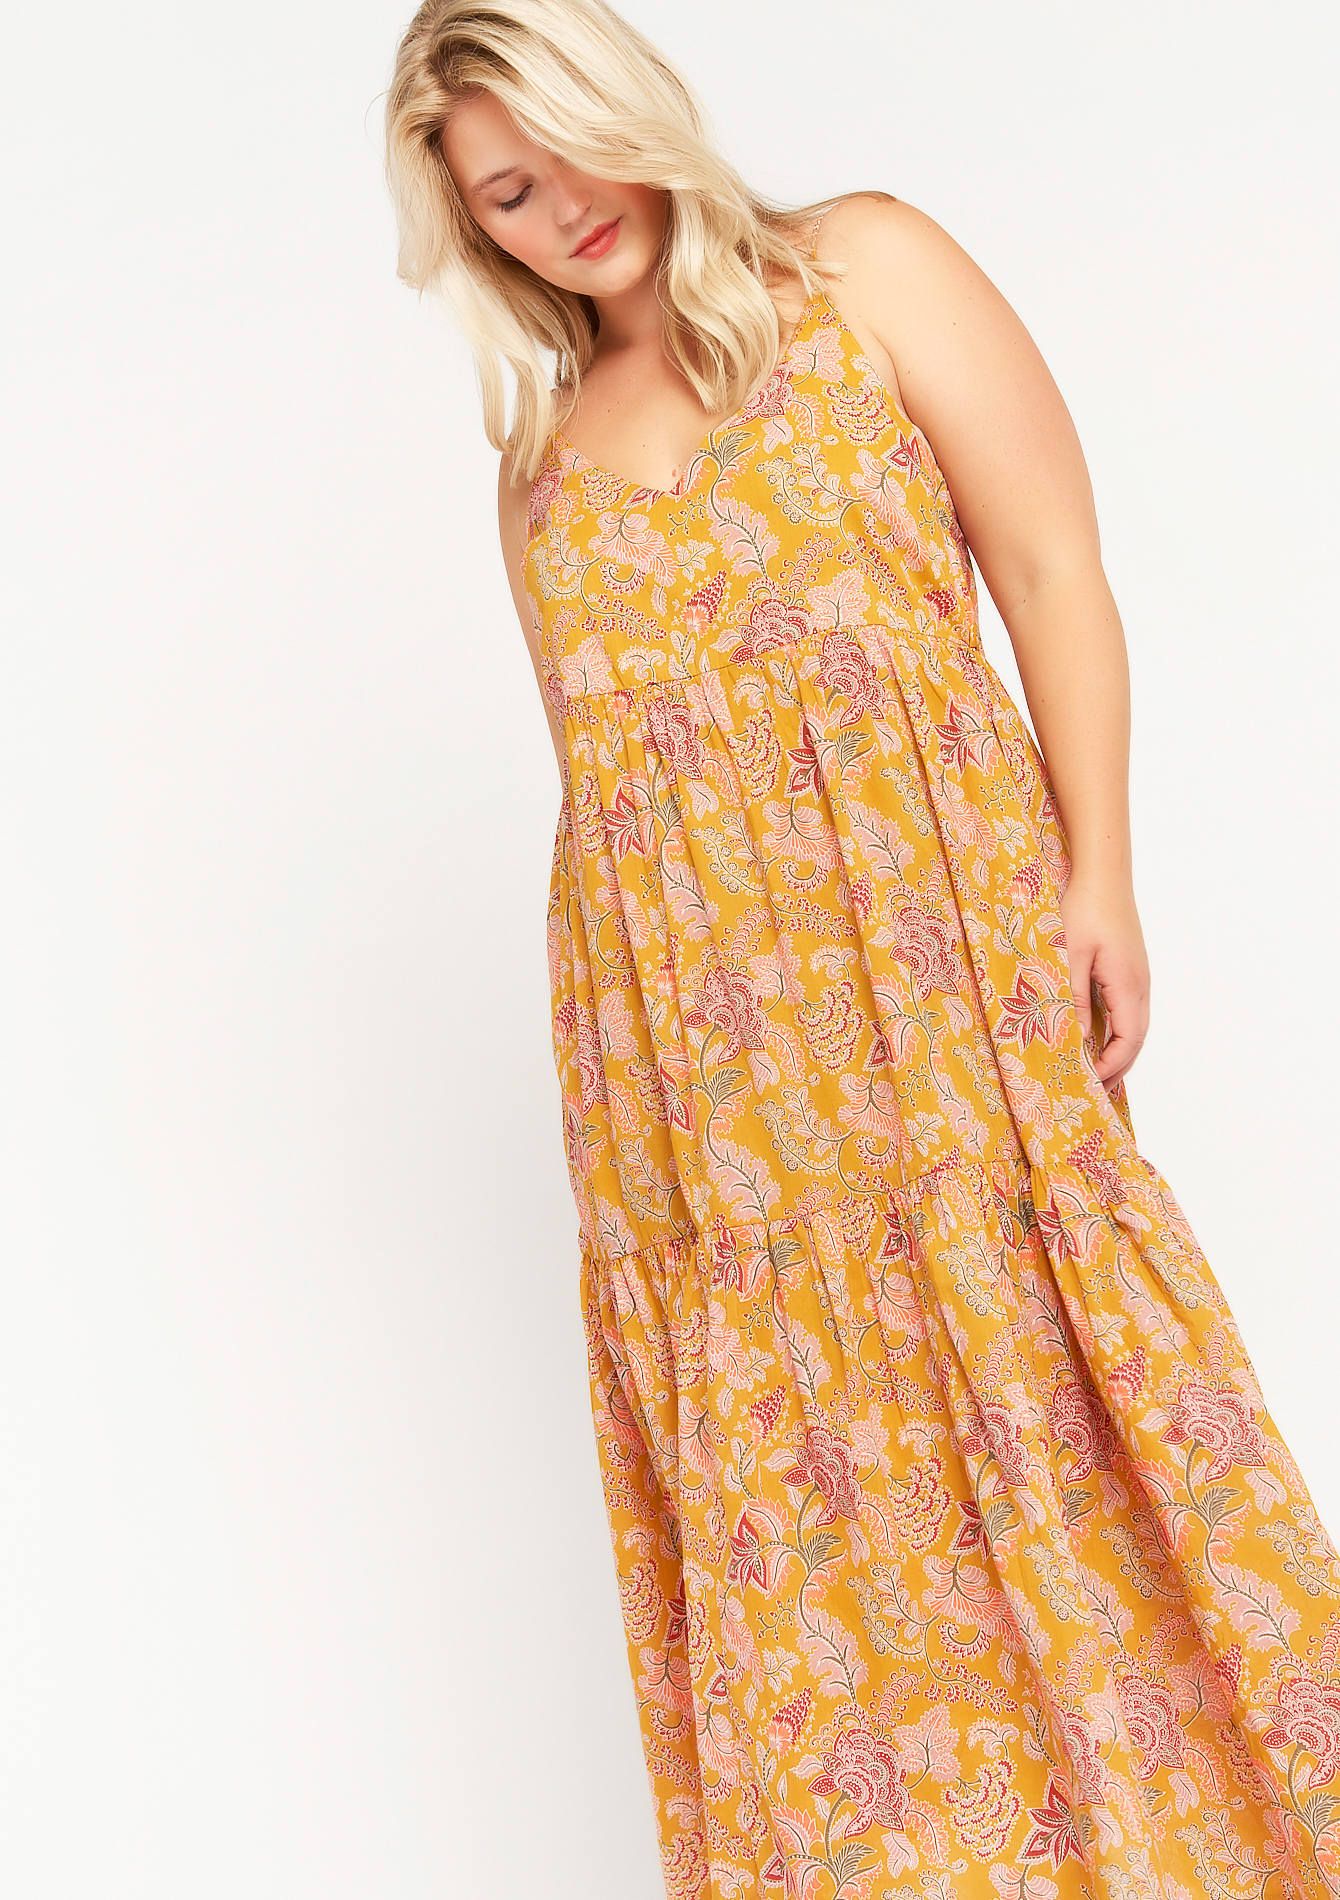 Robe longue avec imprimé floral - LolaLiza - Modalova